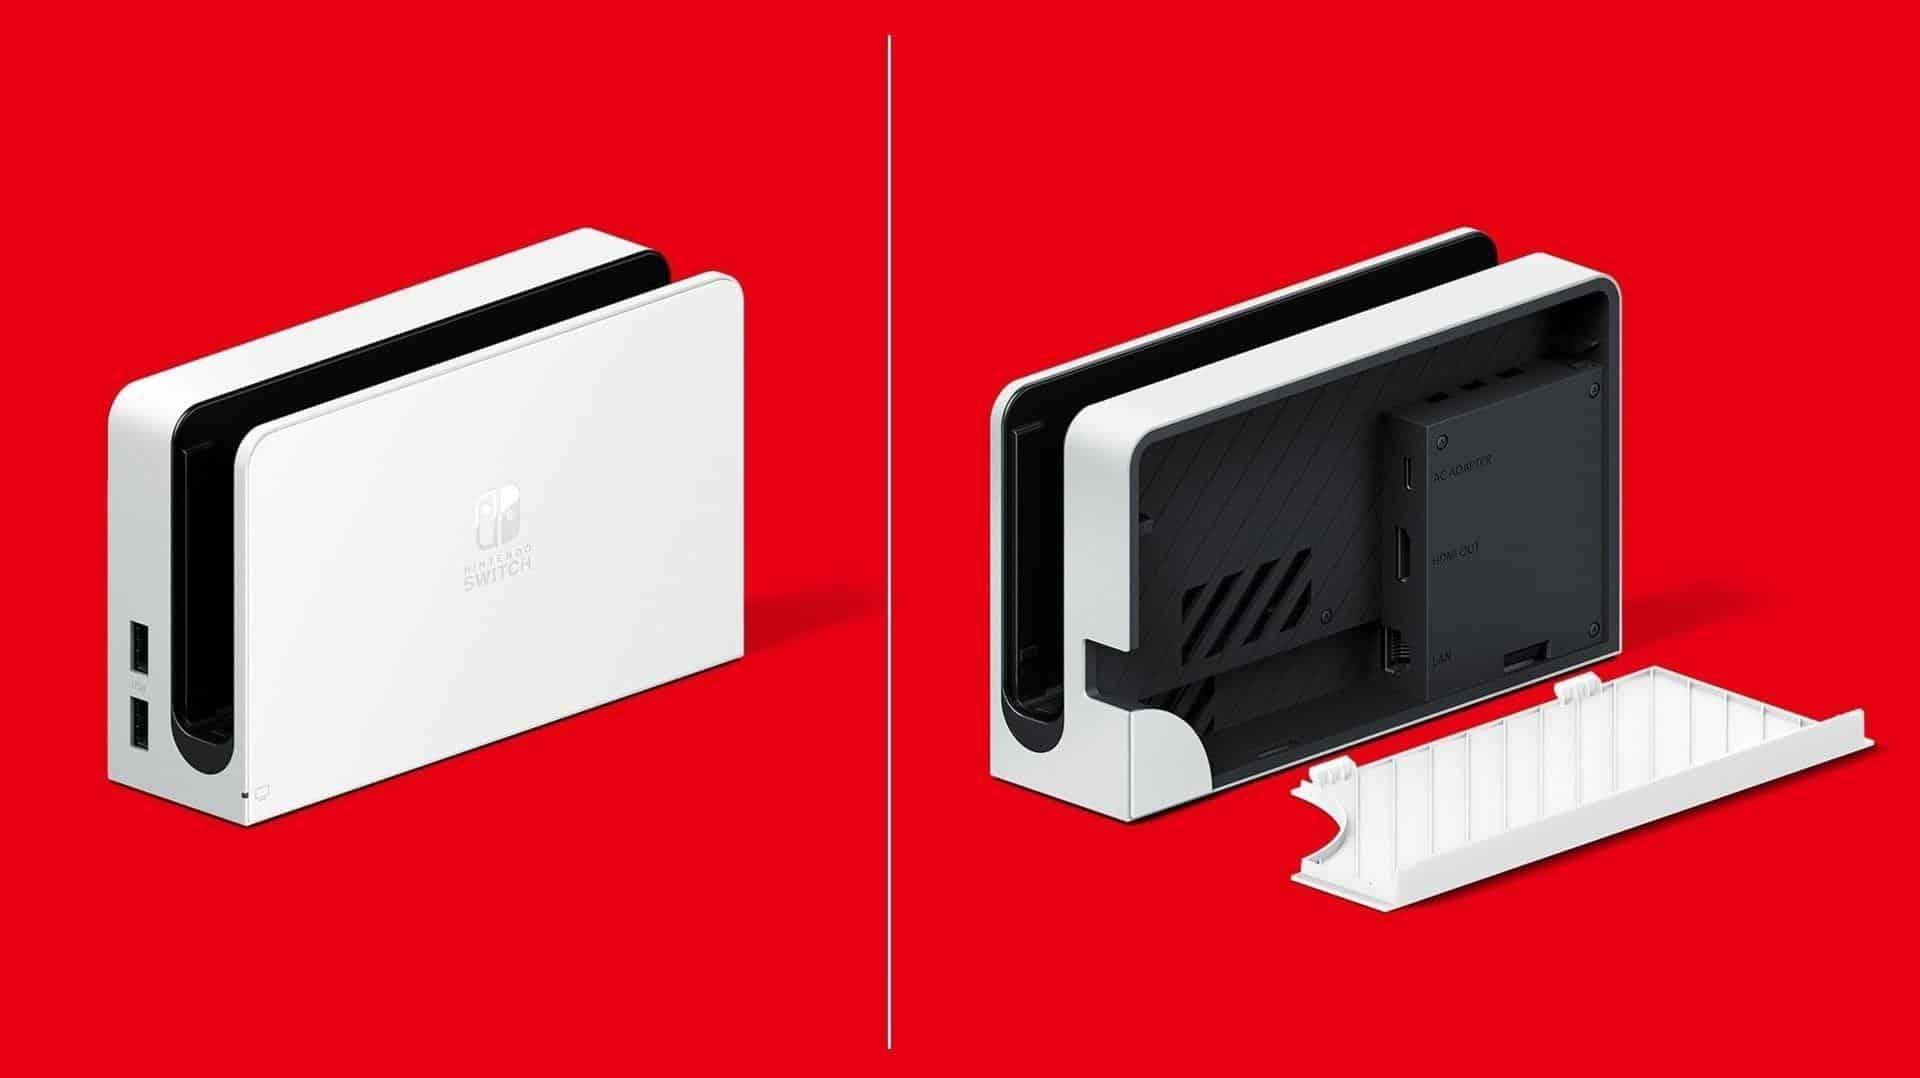 Nintendo Switch Oled Model Dock